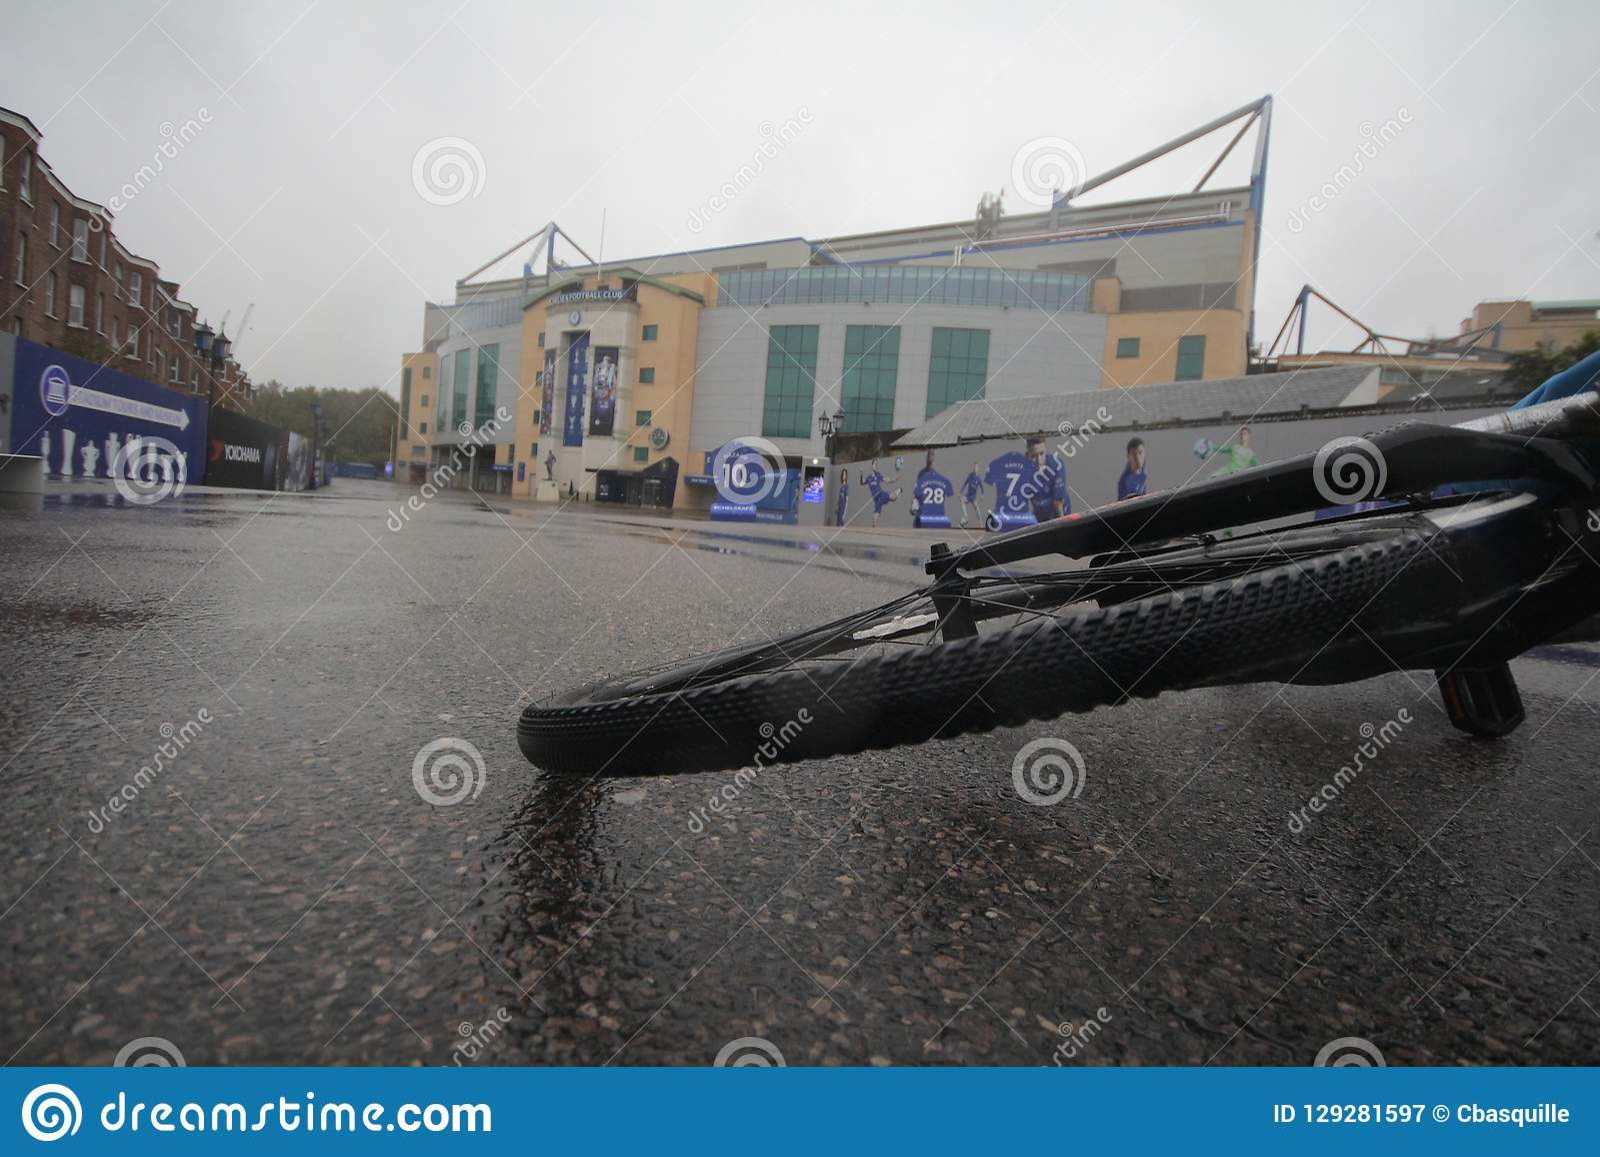 Bike at Stamford Bridge